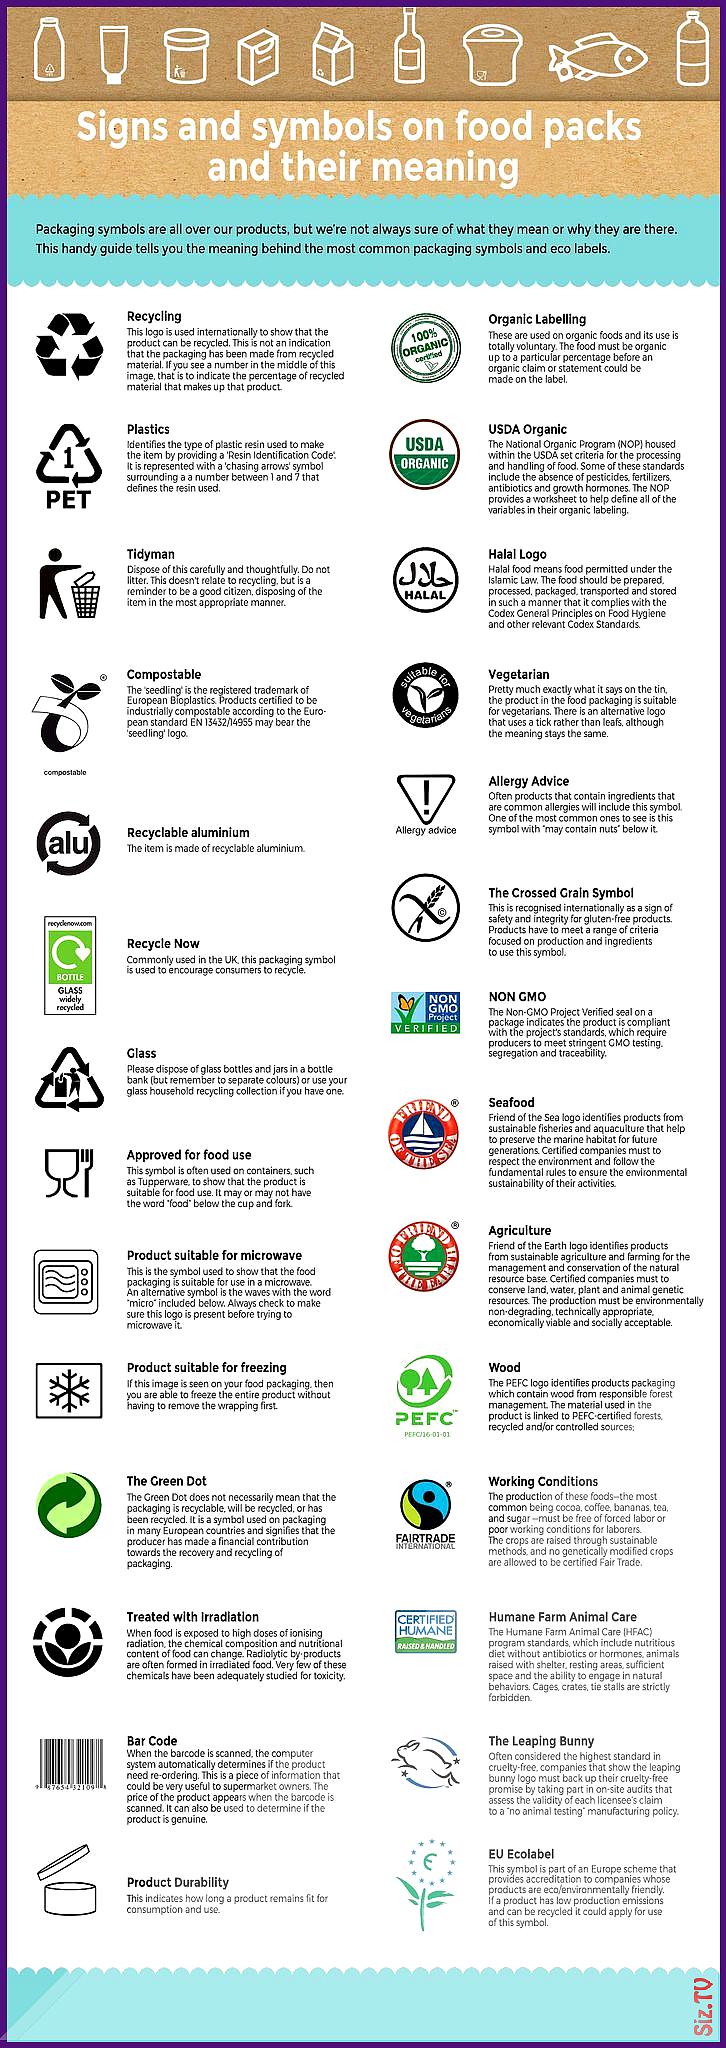 Most Popular Signs Symbols Ecolabels On Food Packaging And Their Meaning Most Popular Signs Symbols Ecolabe In 2020 Food Packaging Recycling Information Organic Labels